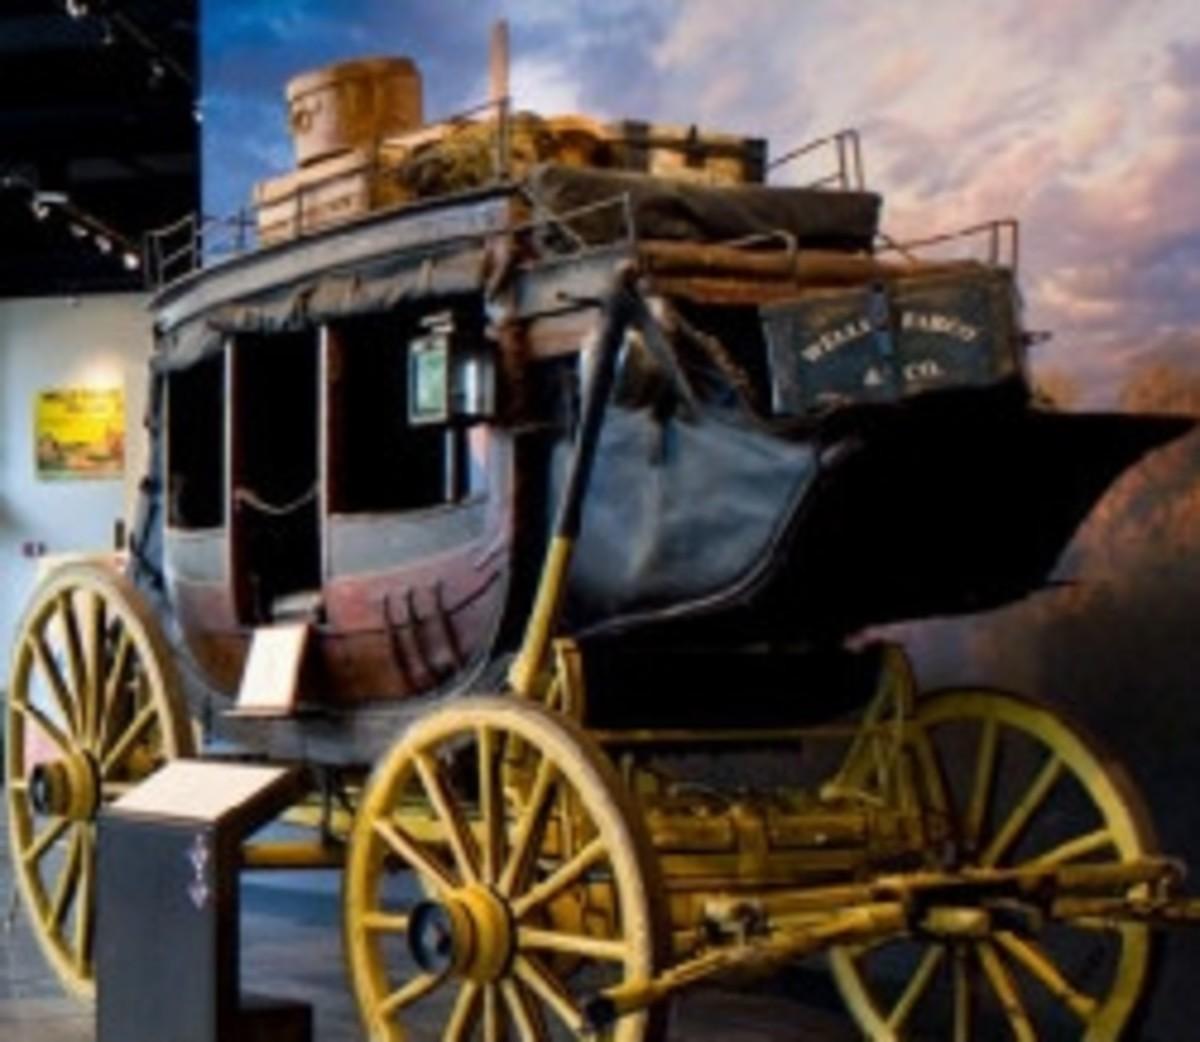 Stagecoach at the Wells Fargo Museum in Phoenix, AZ.